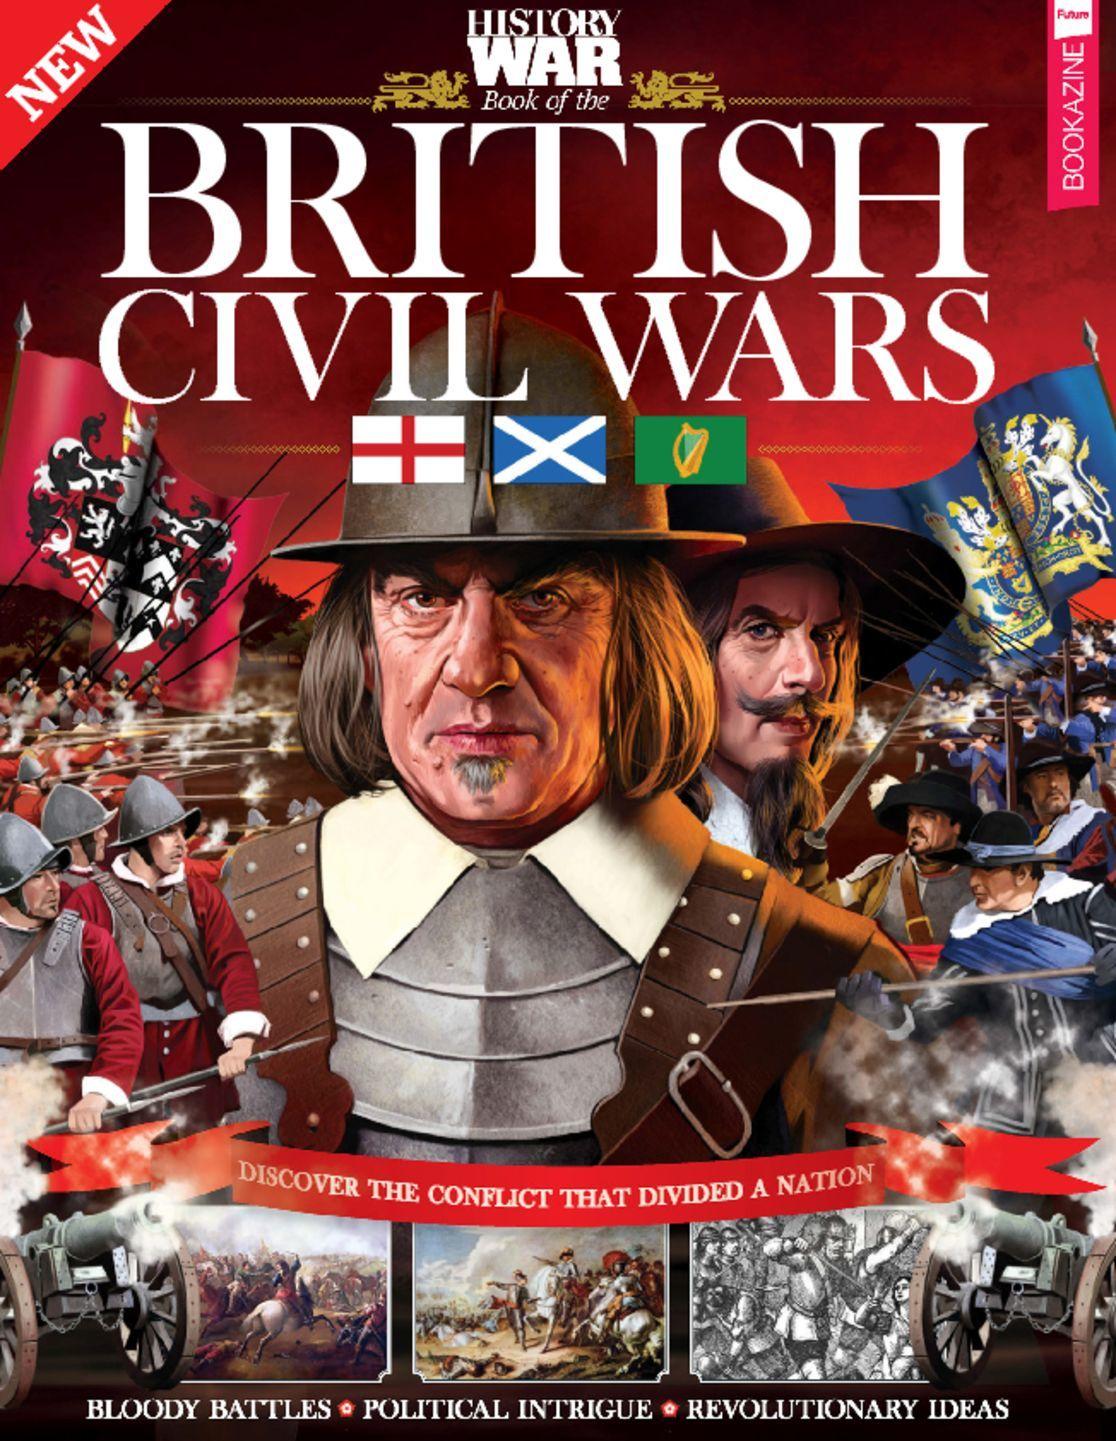 History Of War Book Of The British Civil Wars Digital